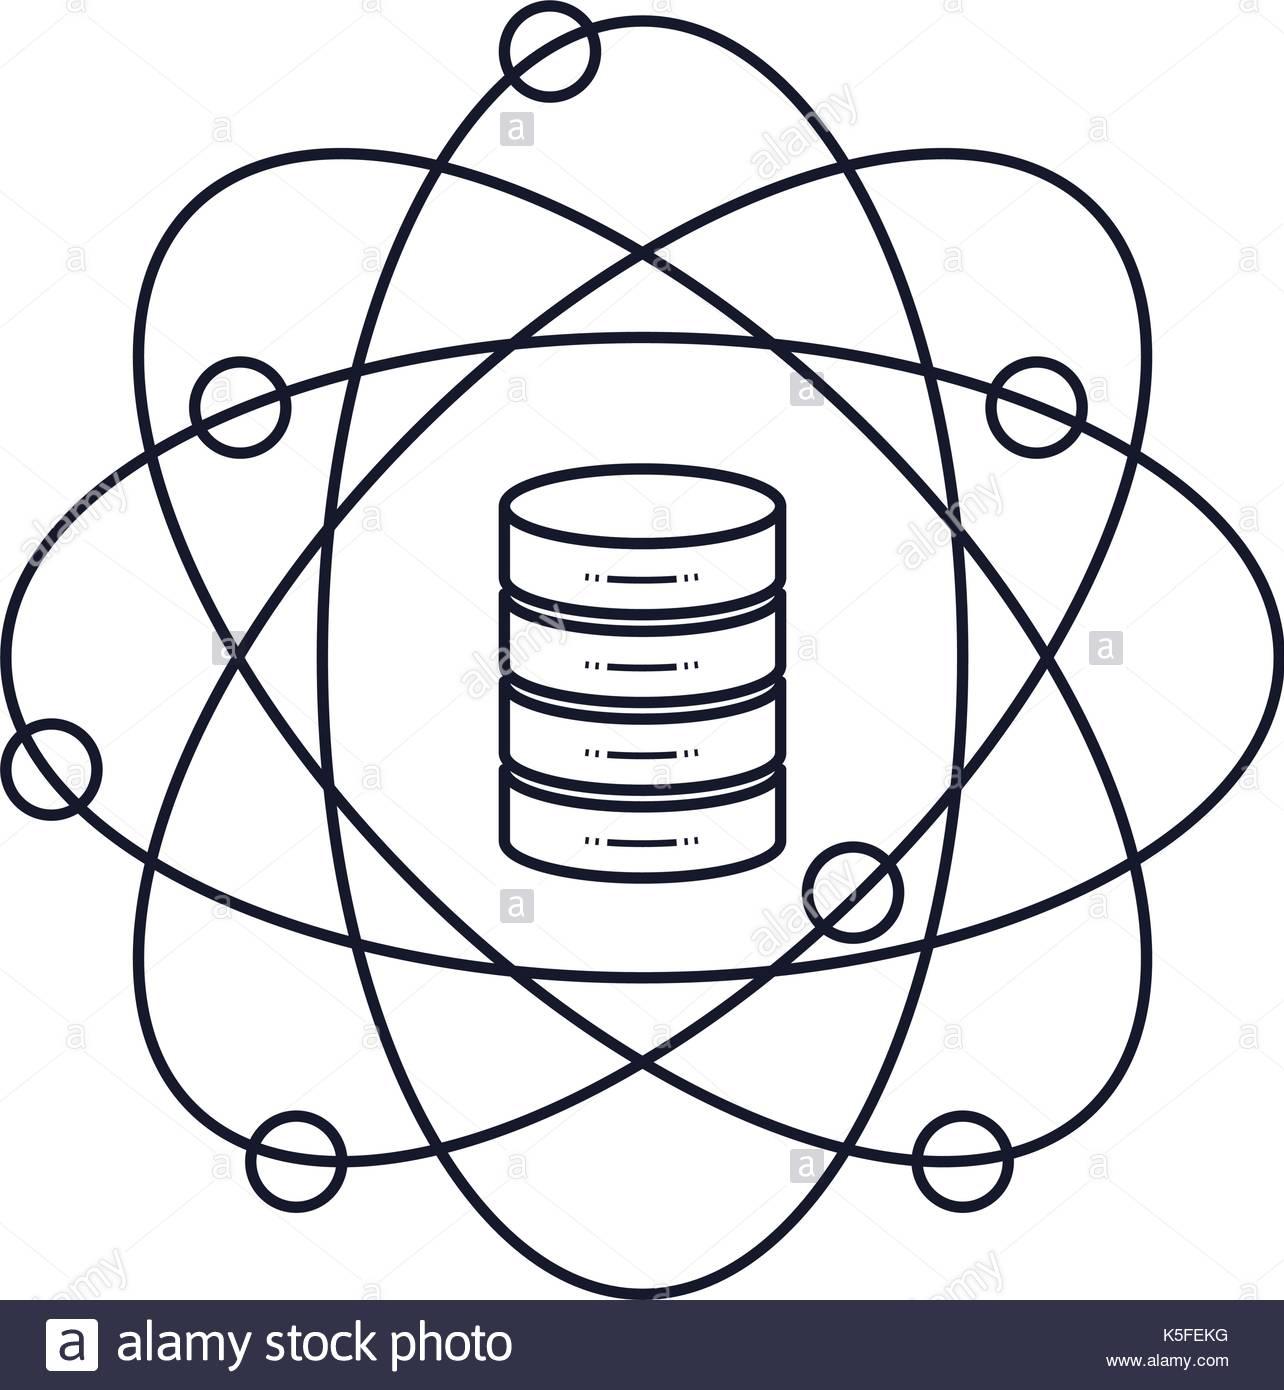 1284x1390 Data Science Atom Around Of Server Icon Monochrome Silhouette